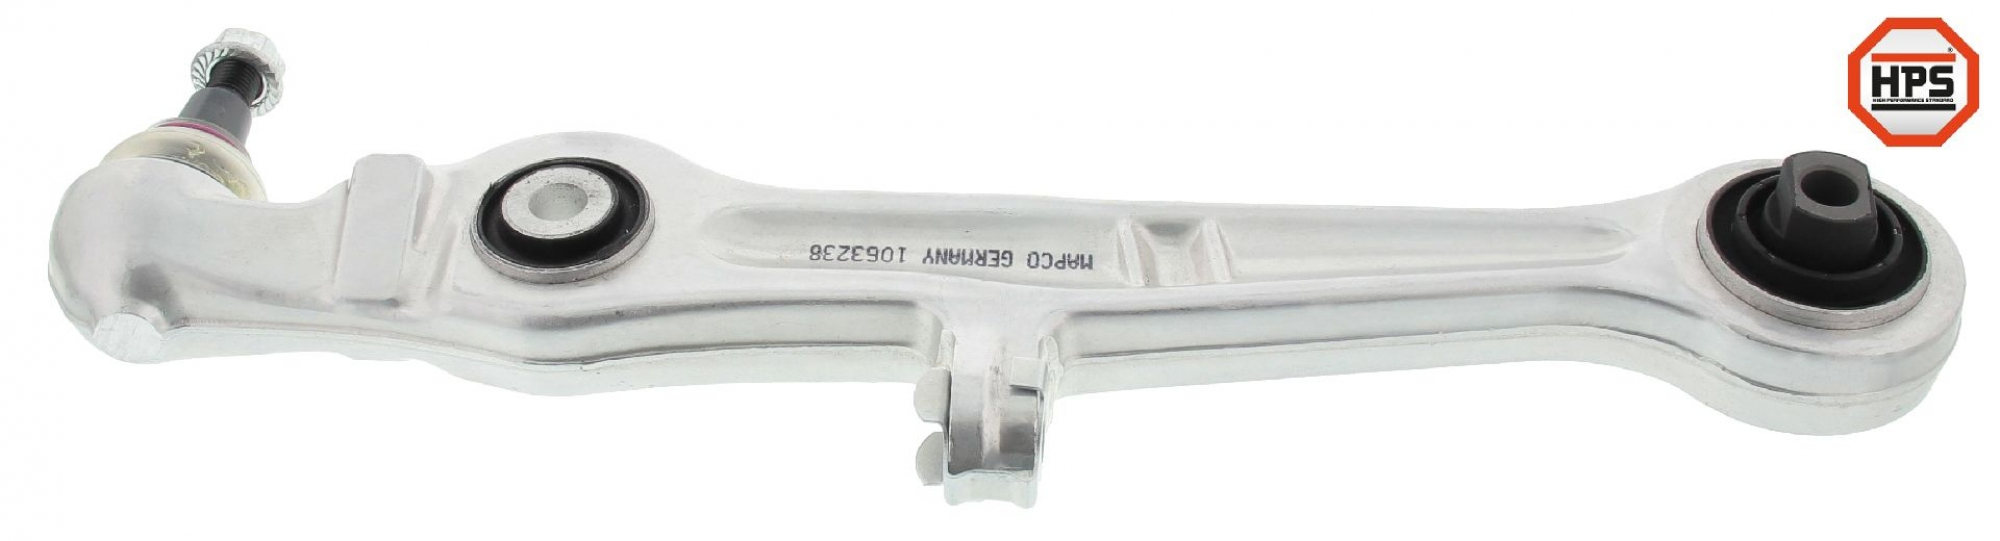 MAPCO 51710HPS control arm